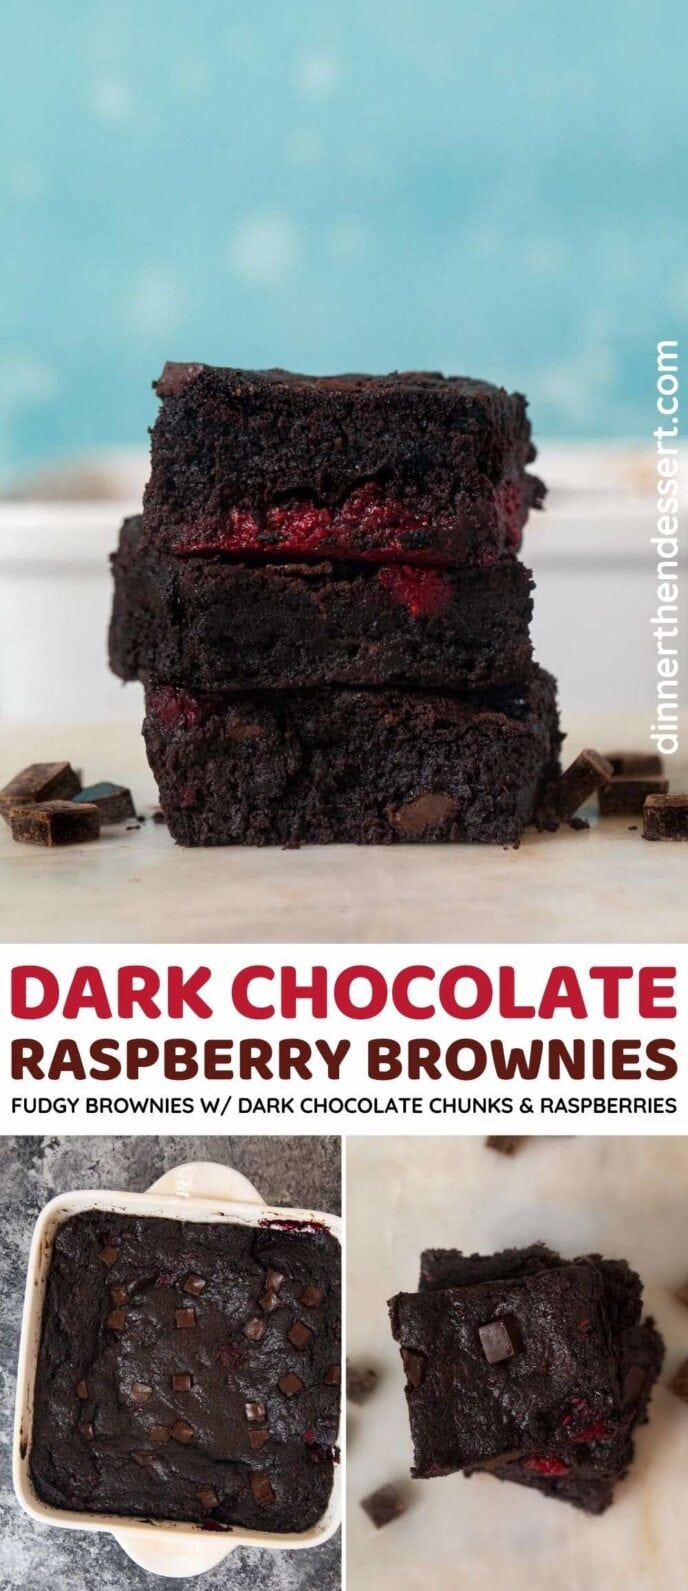 Dark Chocolate Raspberry Brownies collage